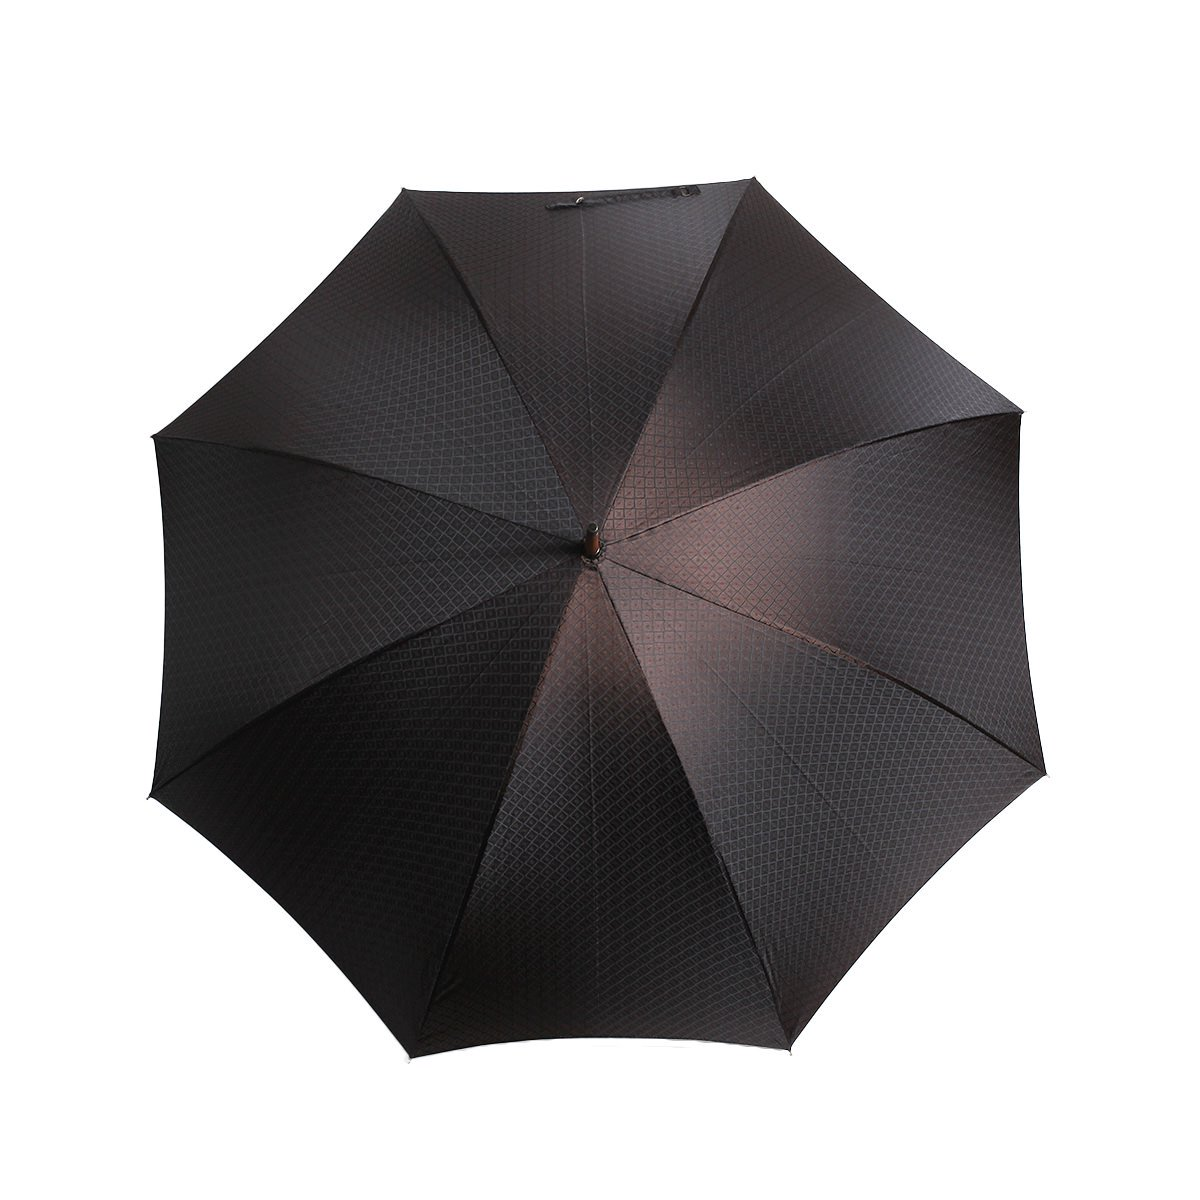 【WEB限定】FOX Frames 小紋柄 長傘(ブラウン) 詳細画像8